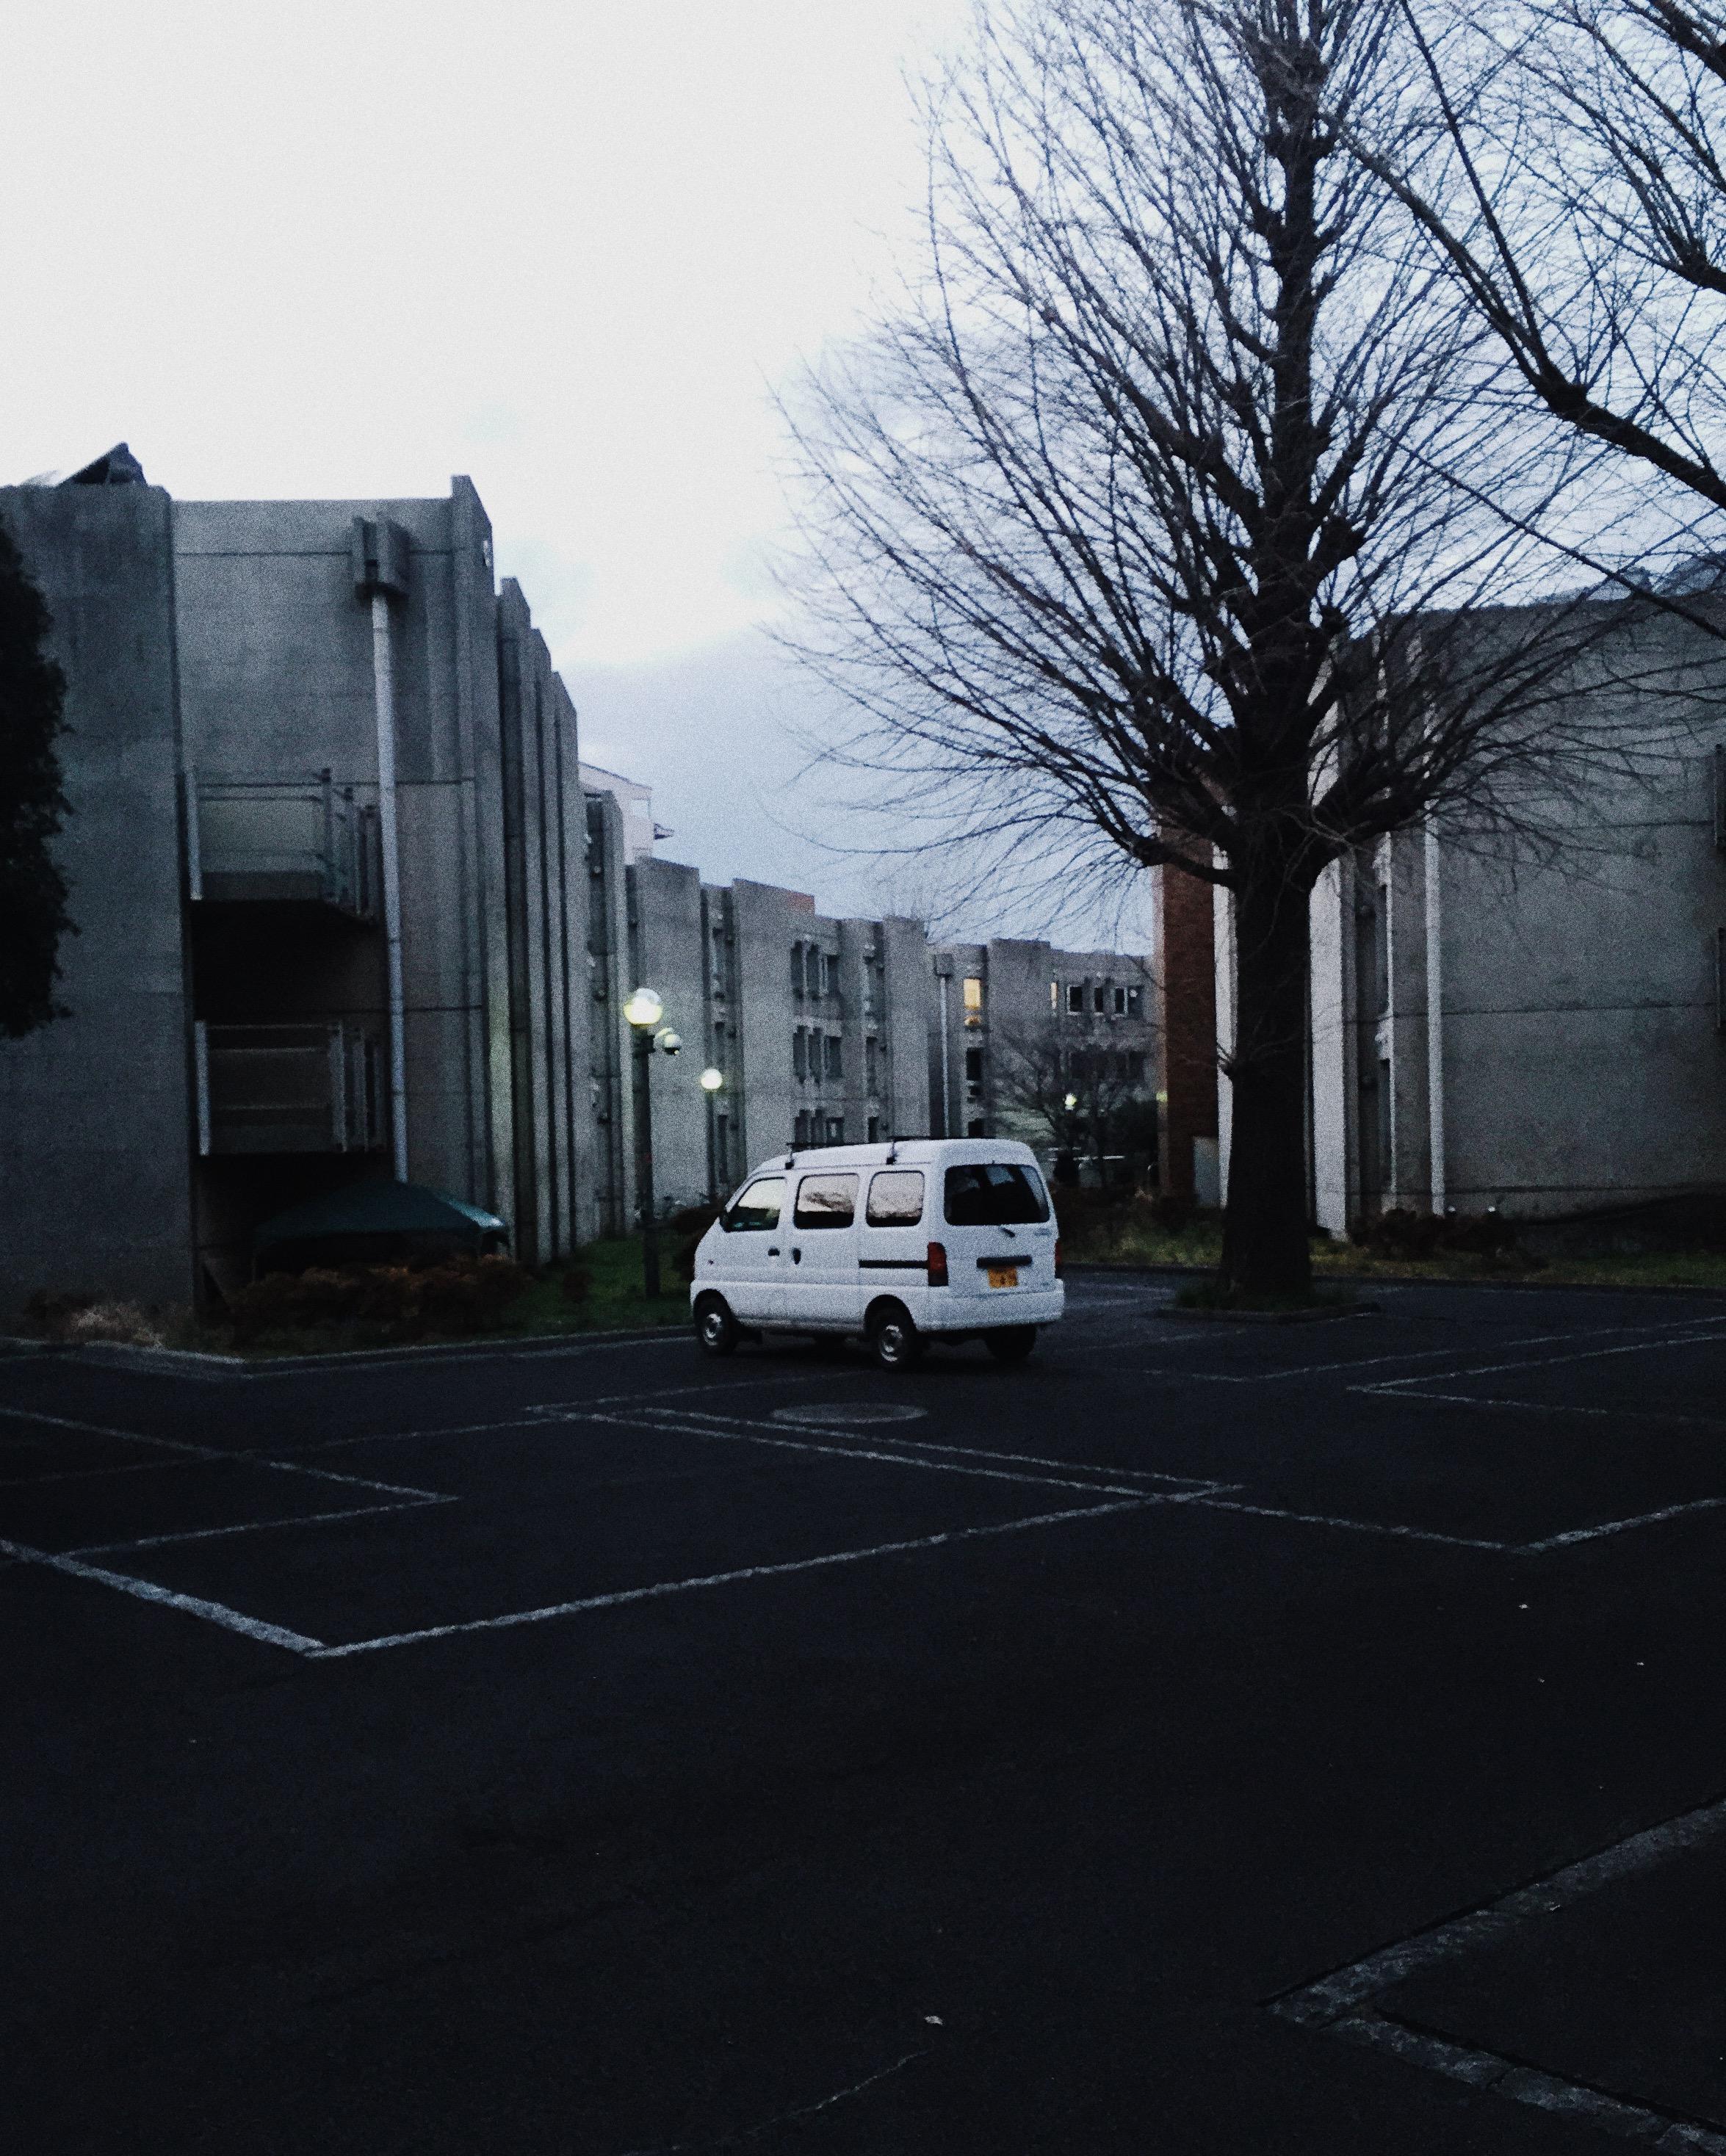 Mitaka International Hall of Residence, Winter 2015.